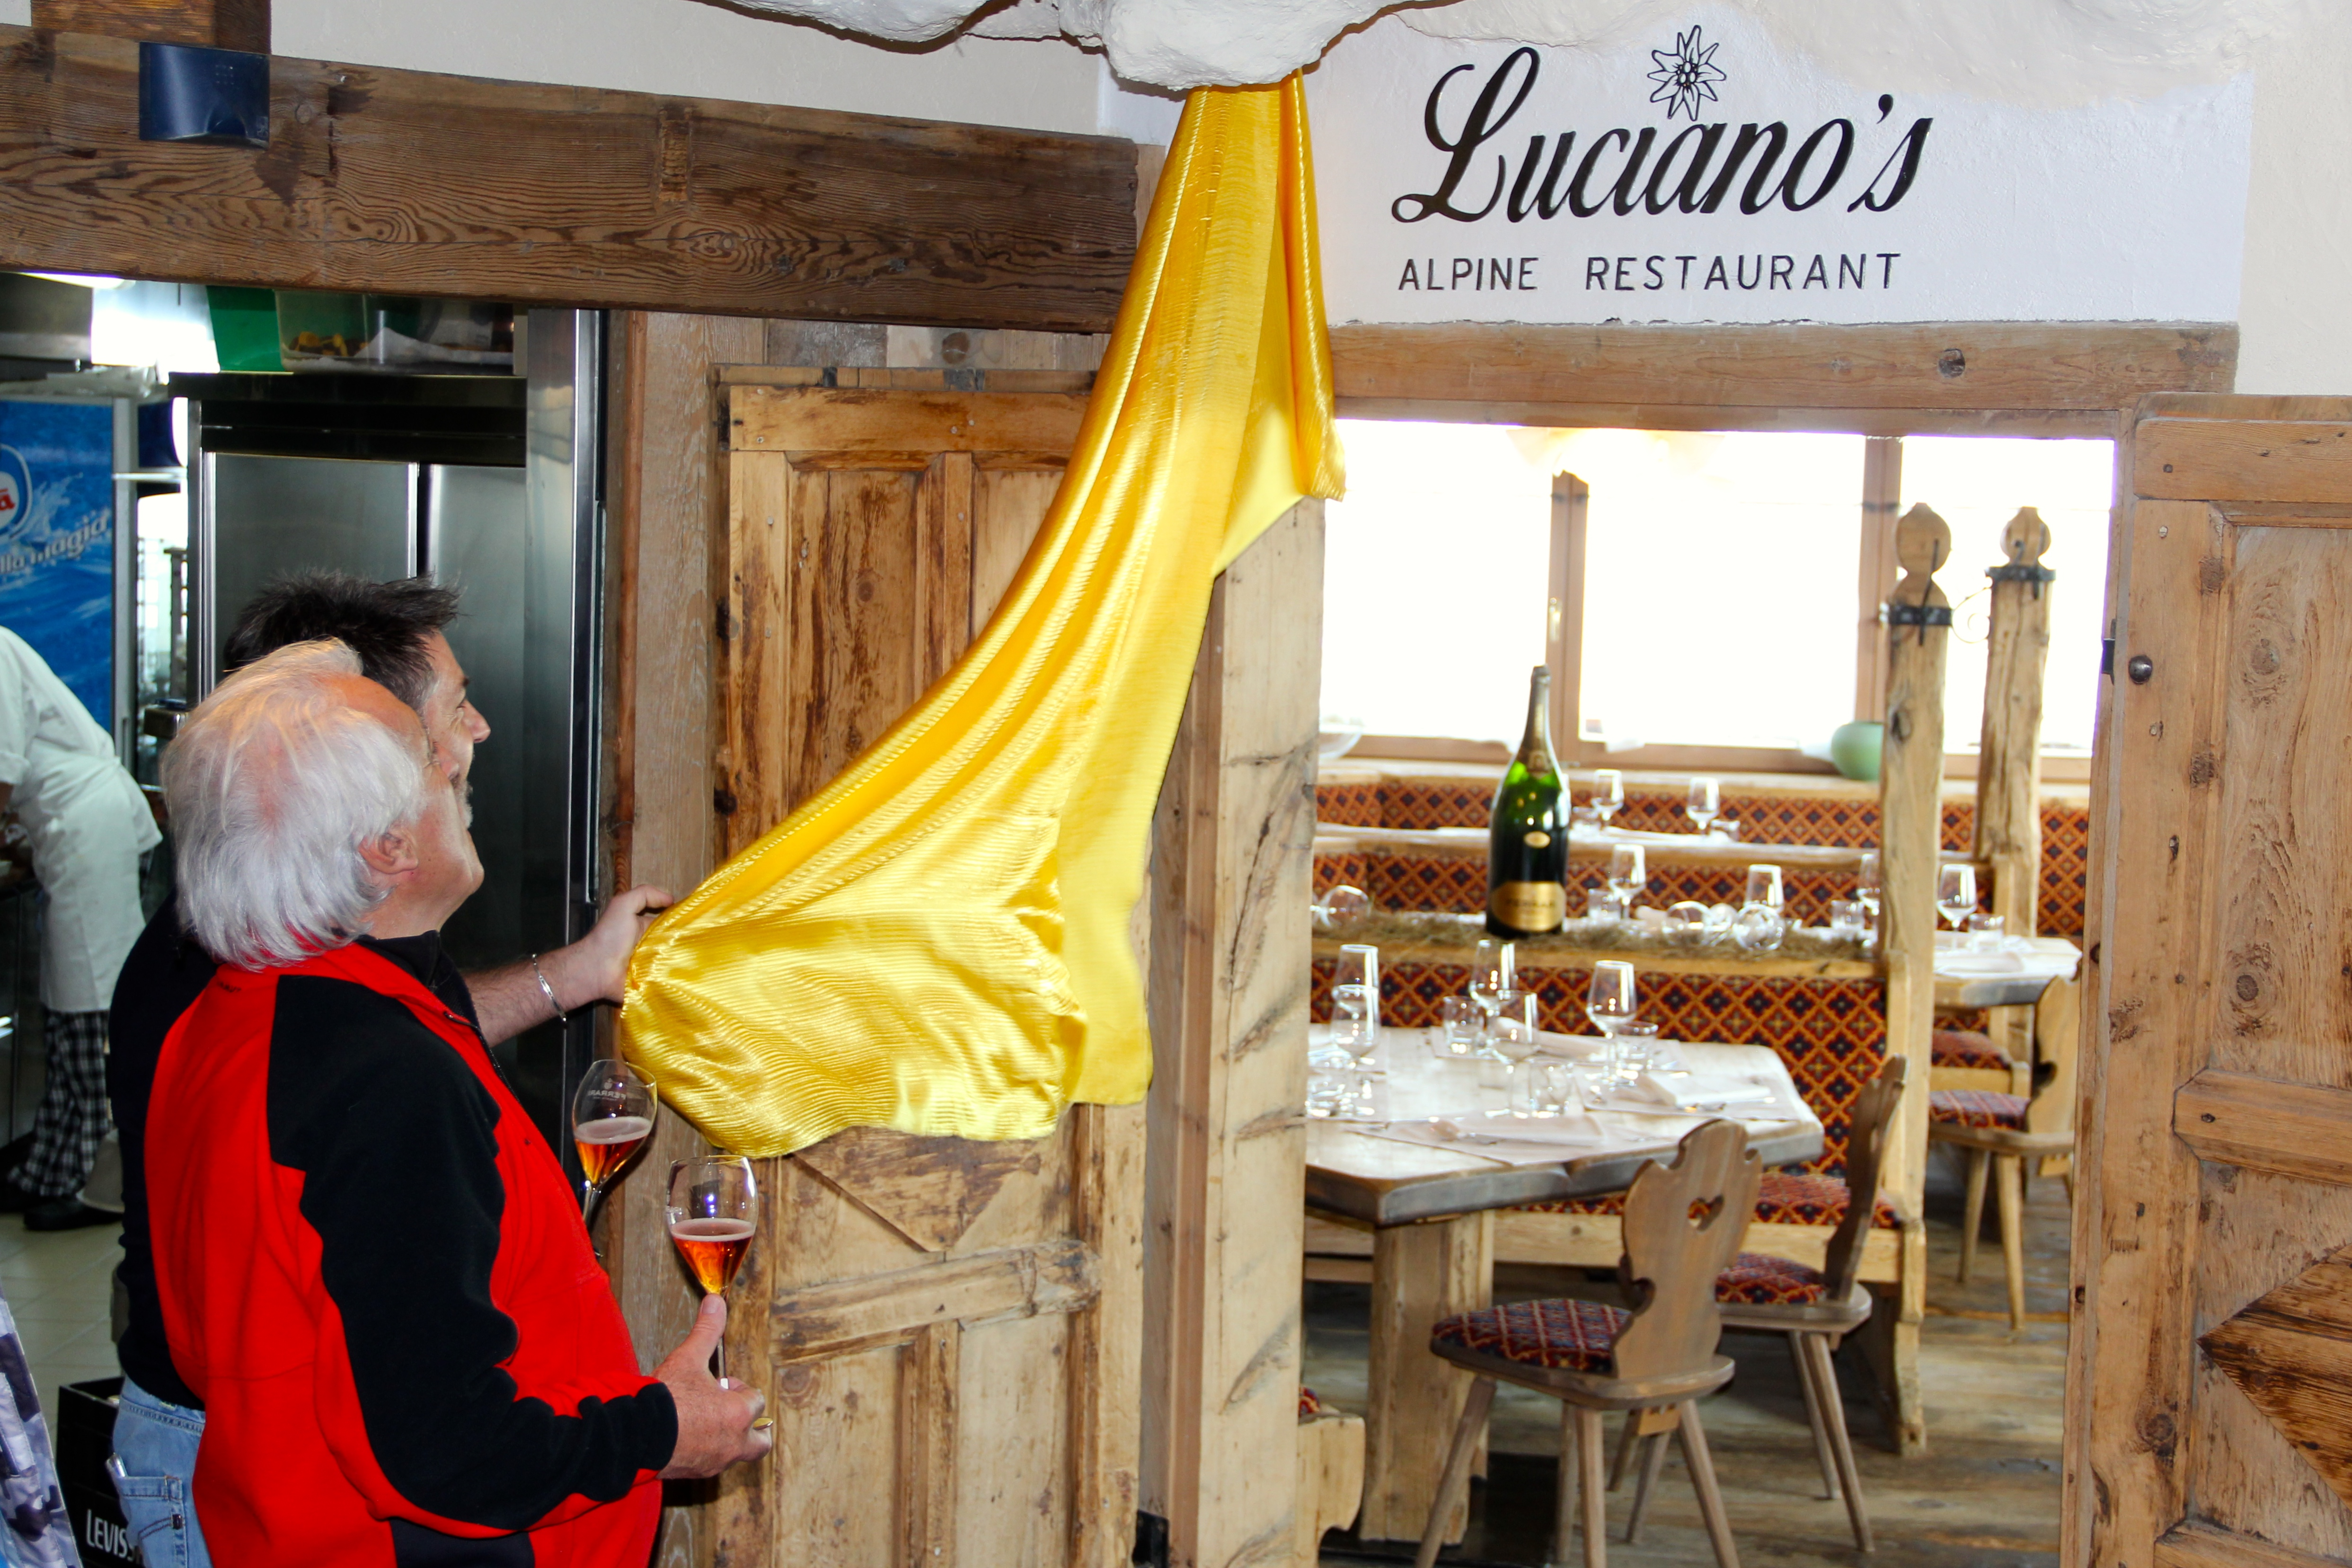 Luciano's Alpine restaurant